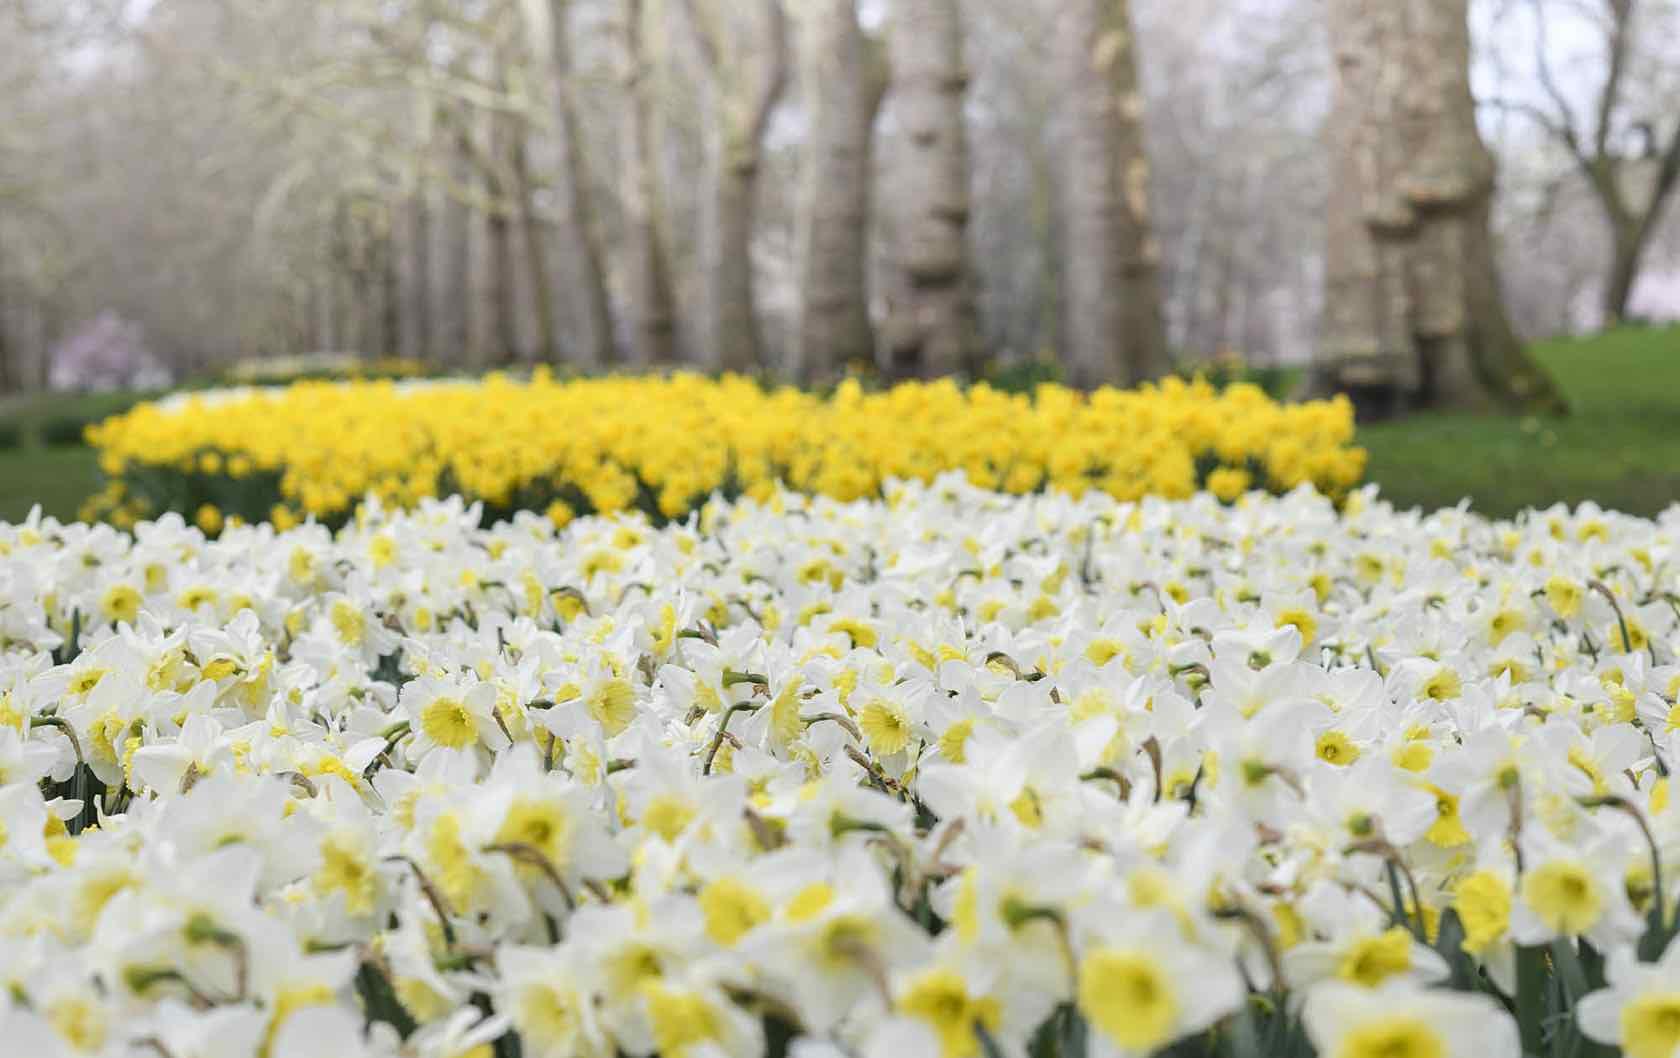 London in spring flowers in park